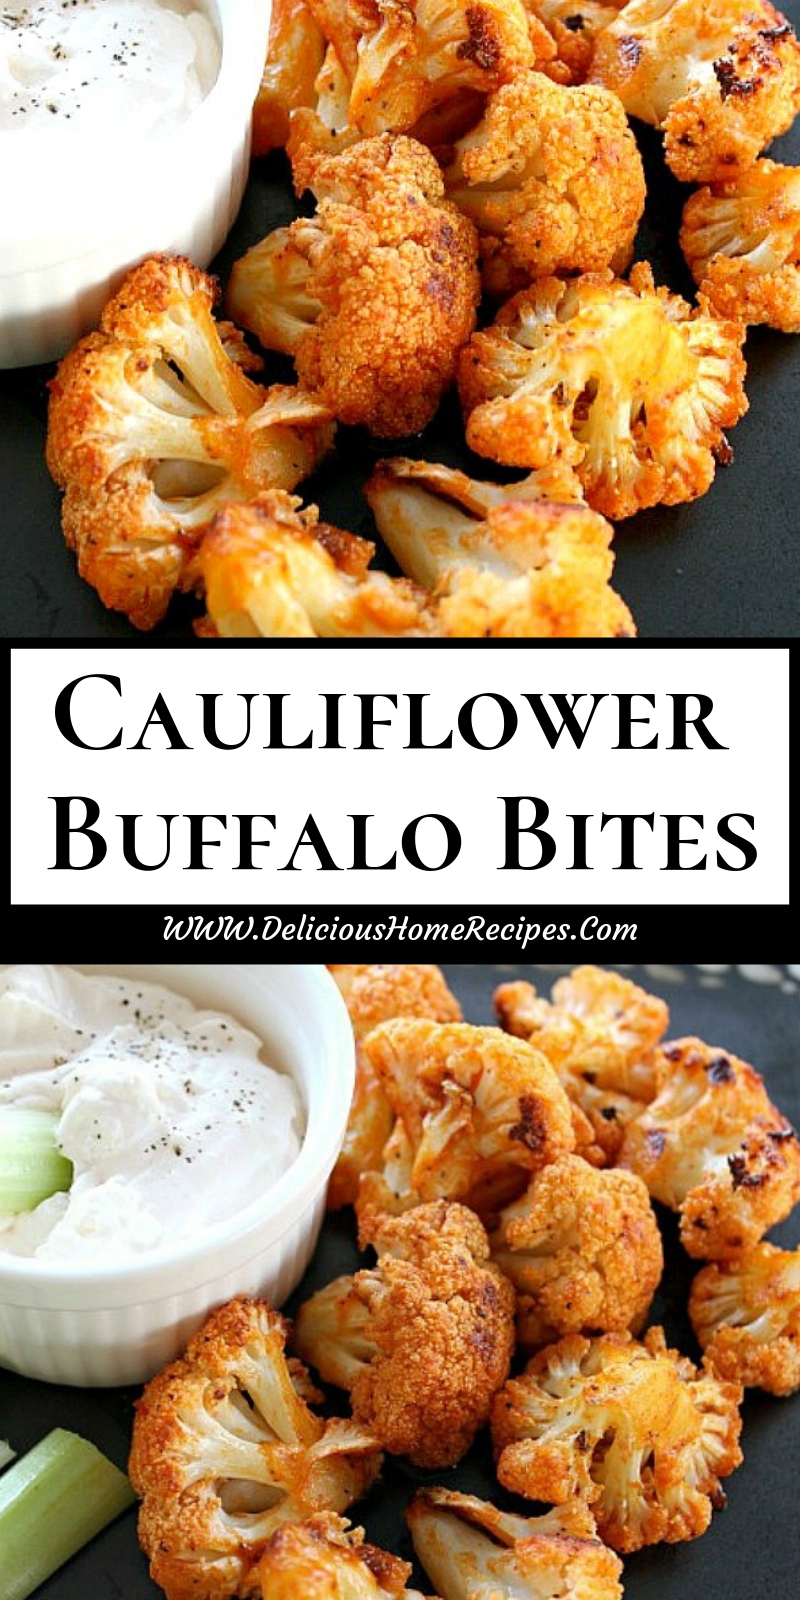 Cauliflower Buffalo Bites